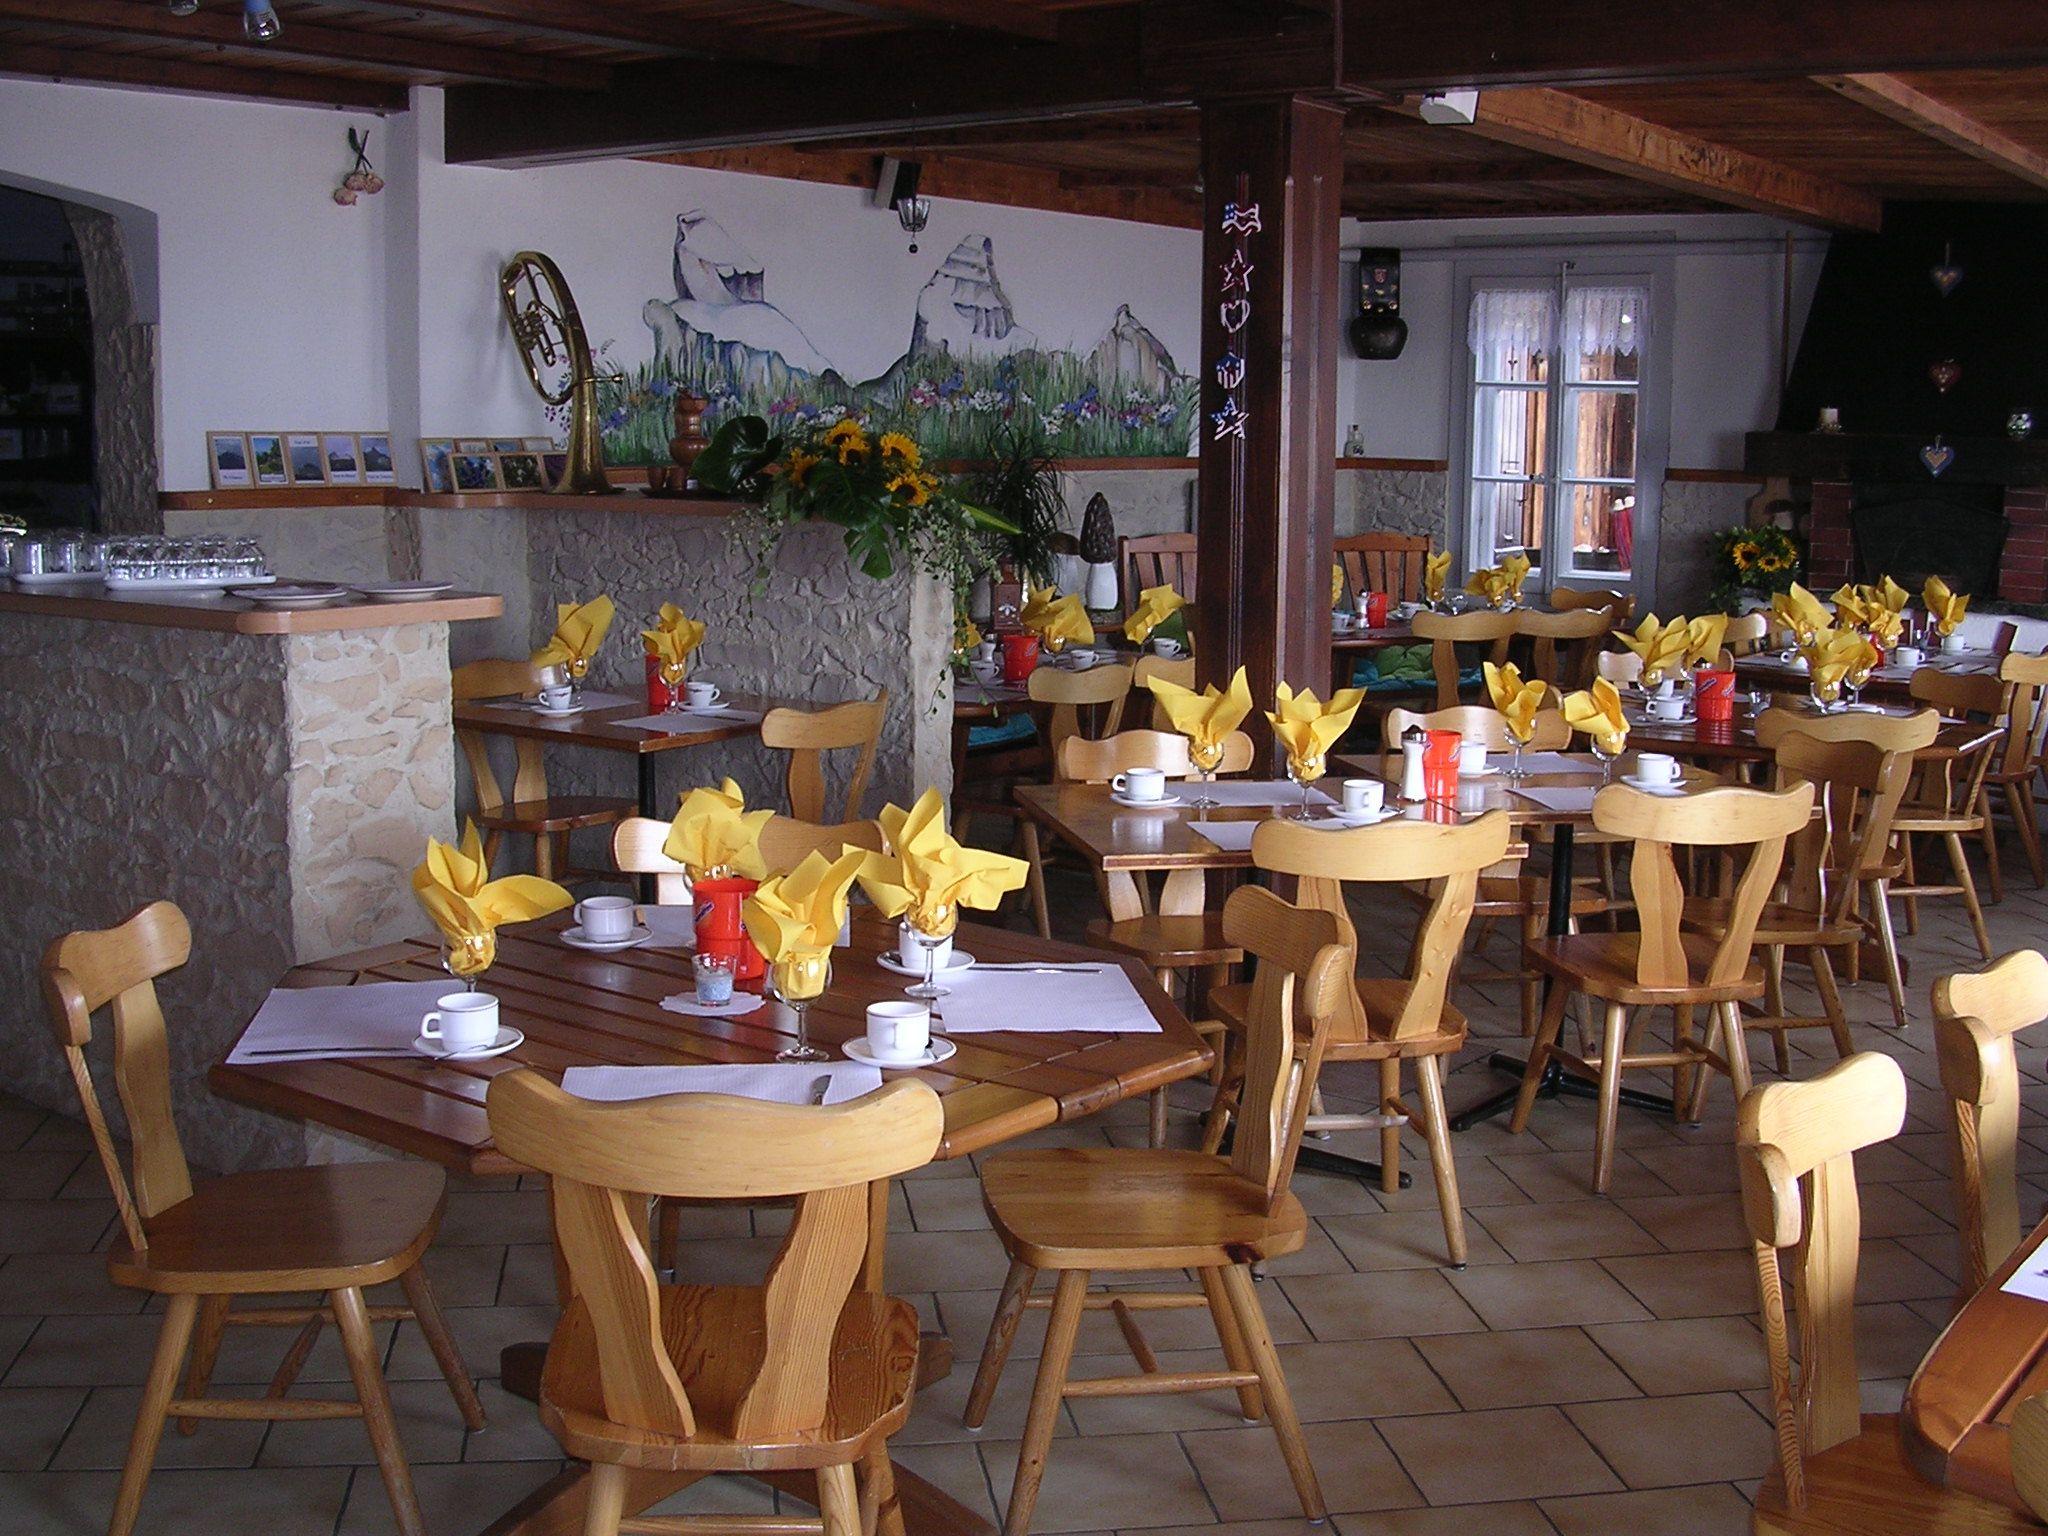 Salle à manger des petitdéjeuners Breakfest diningroom.